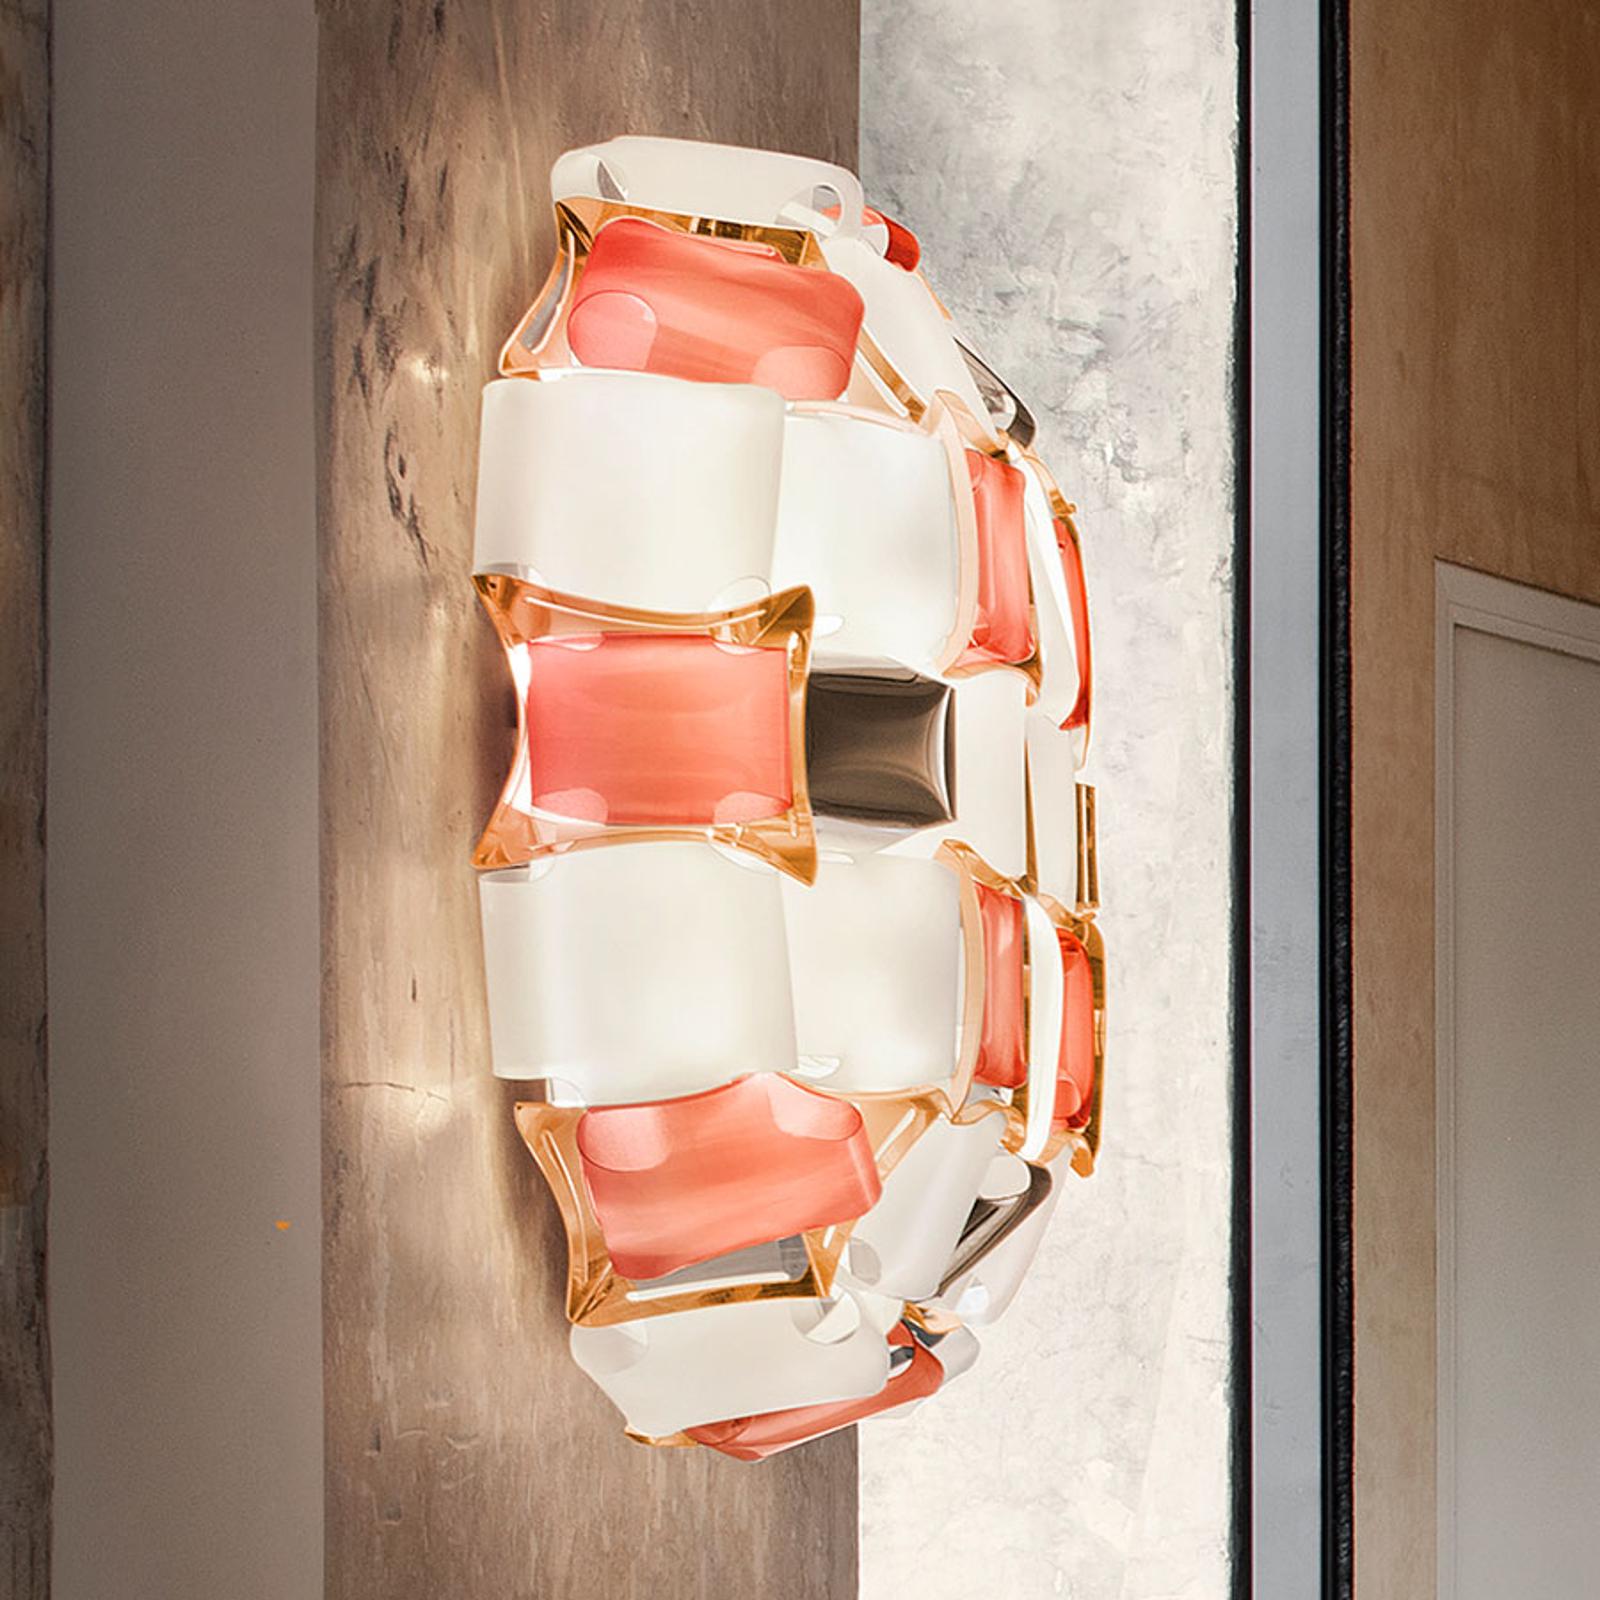 Slamp Mida wandlamp, 32x32 cm rosé/wit